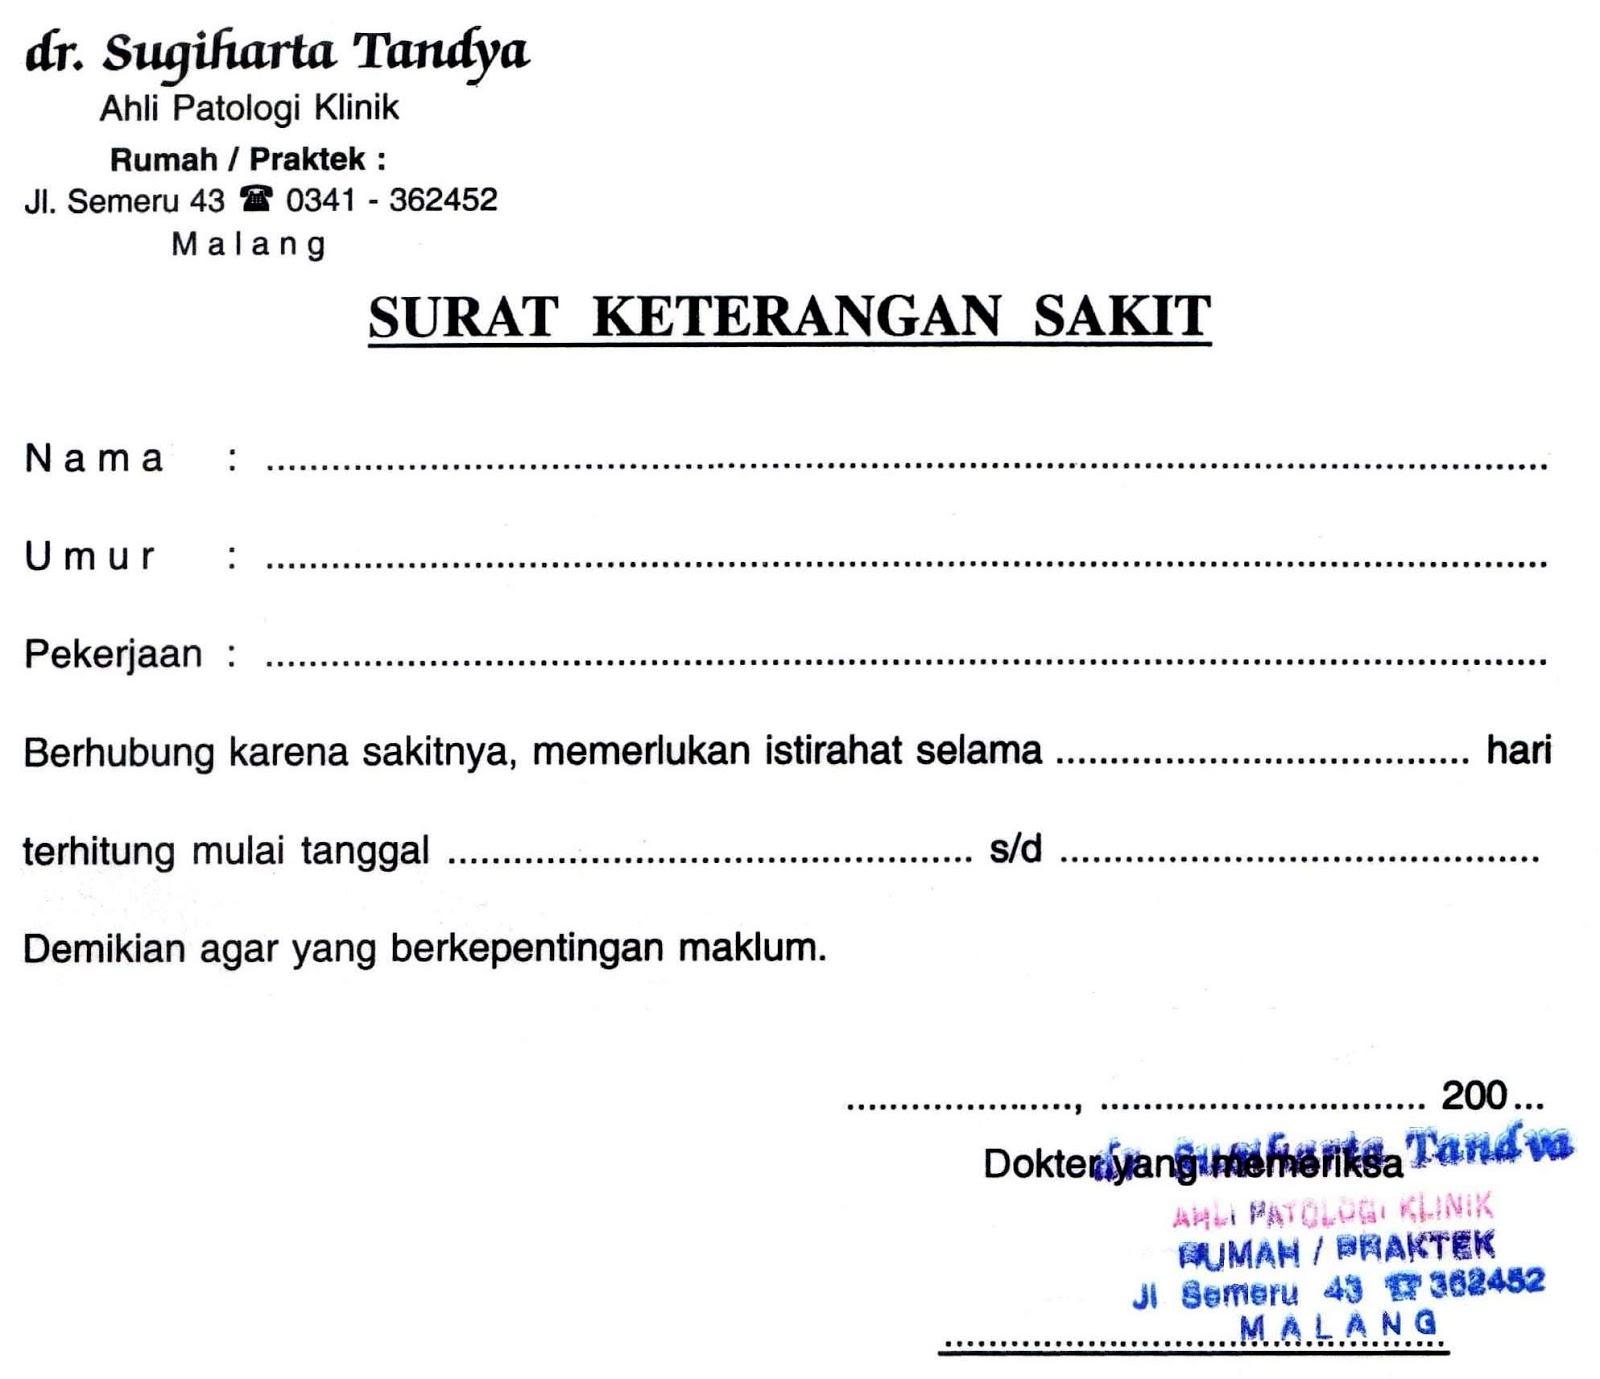 Contoh Surat Dokter Kosong Malang Surat 8